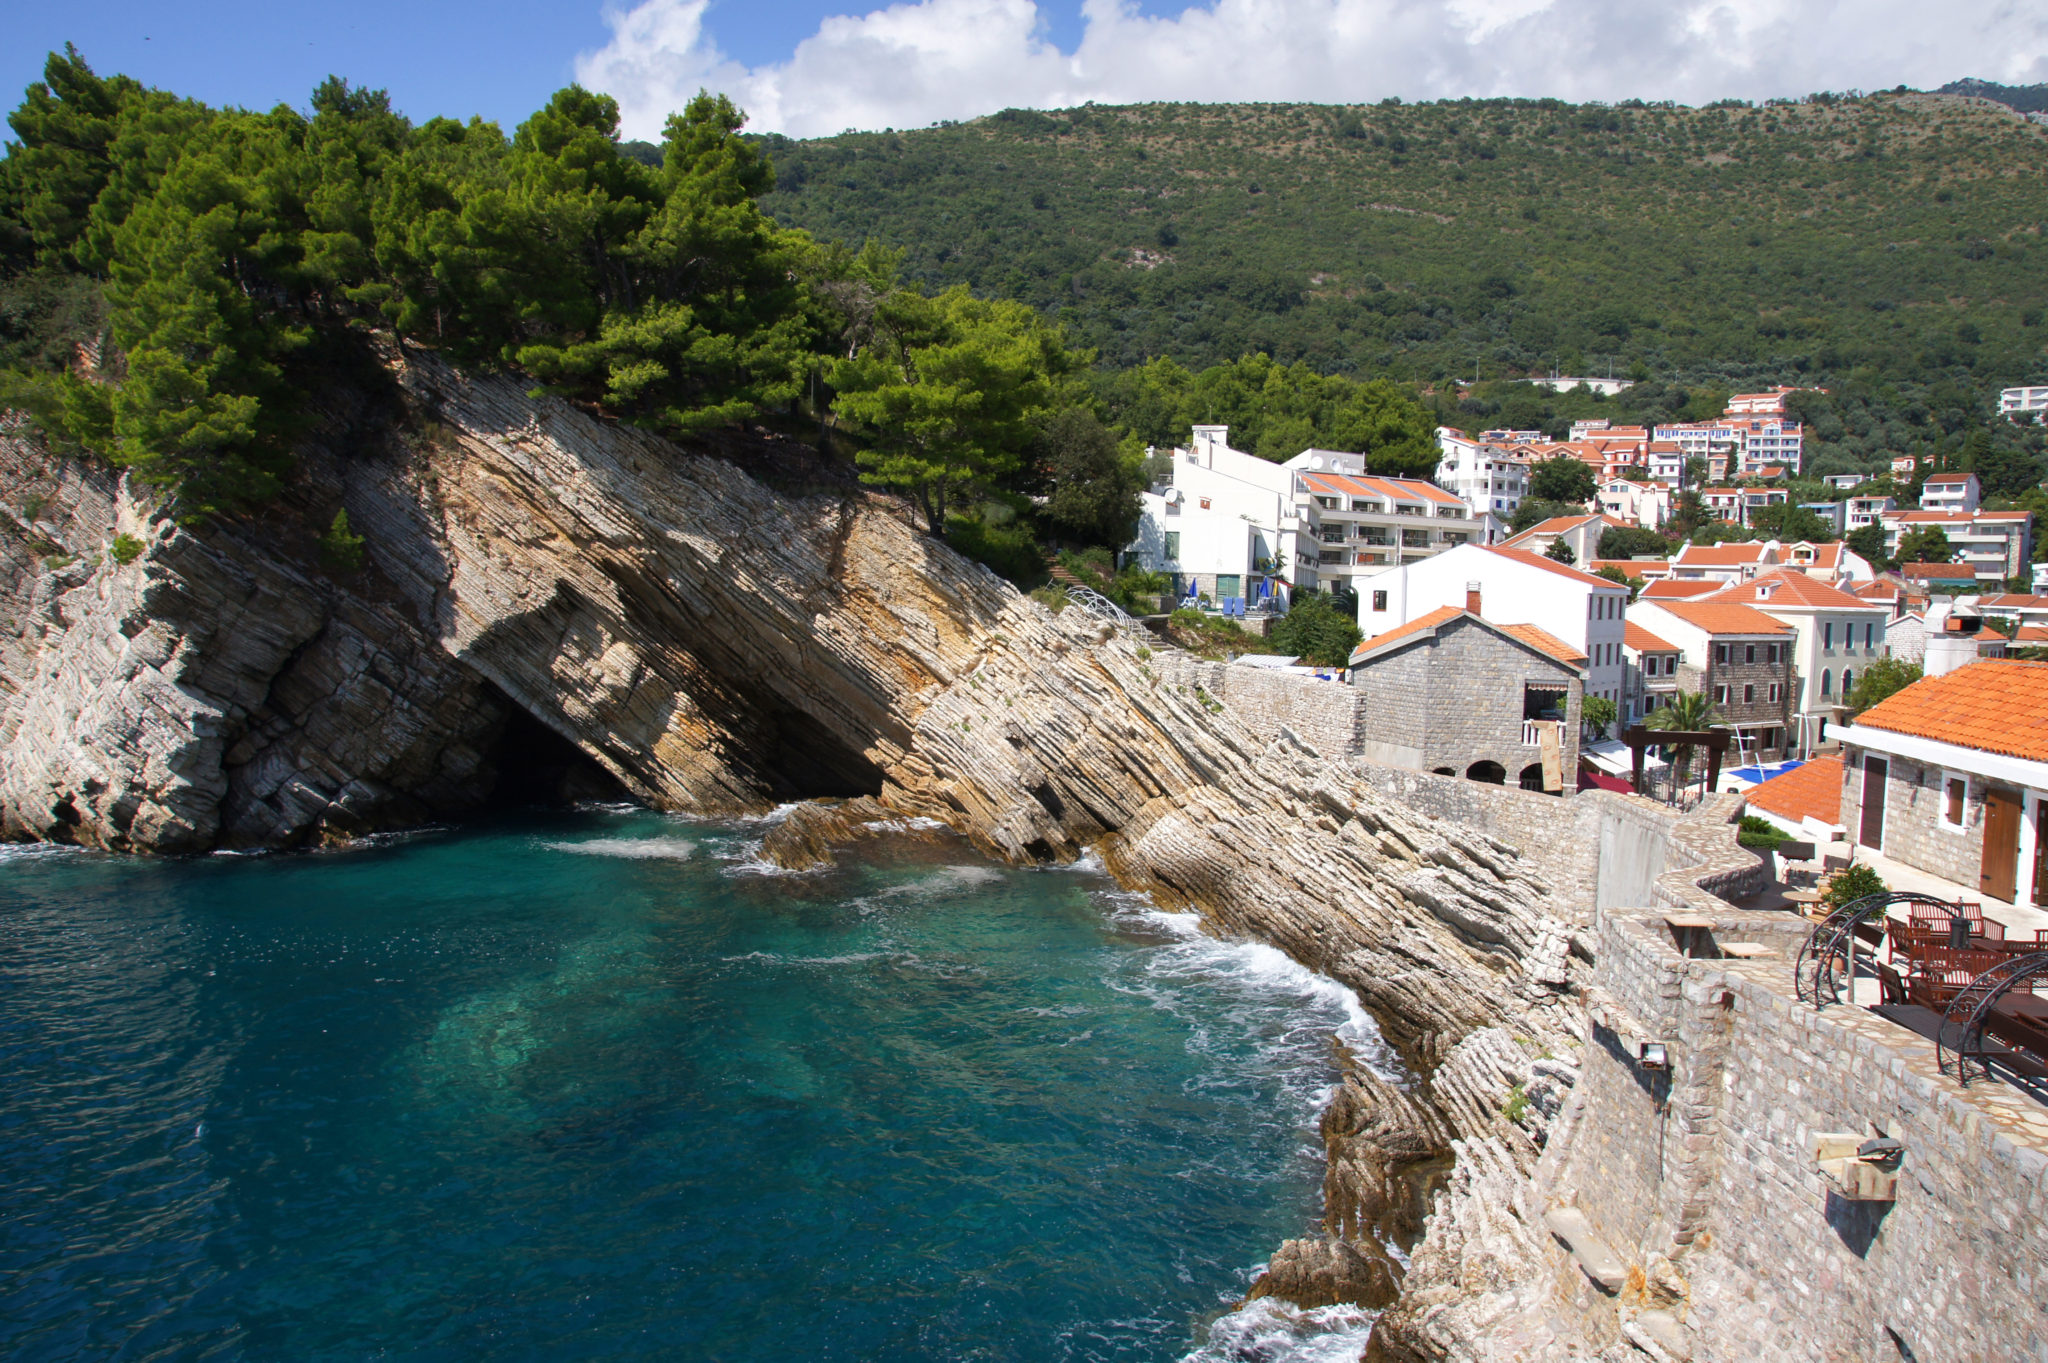 Montenegro : La côte adriatique #3 – Petrovac